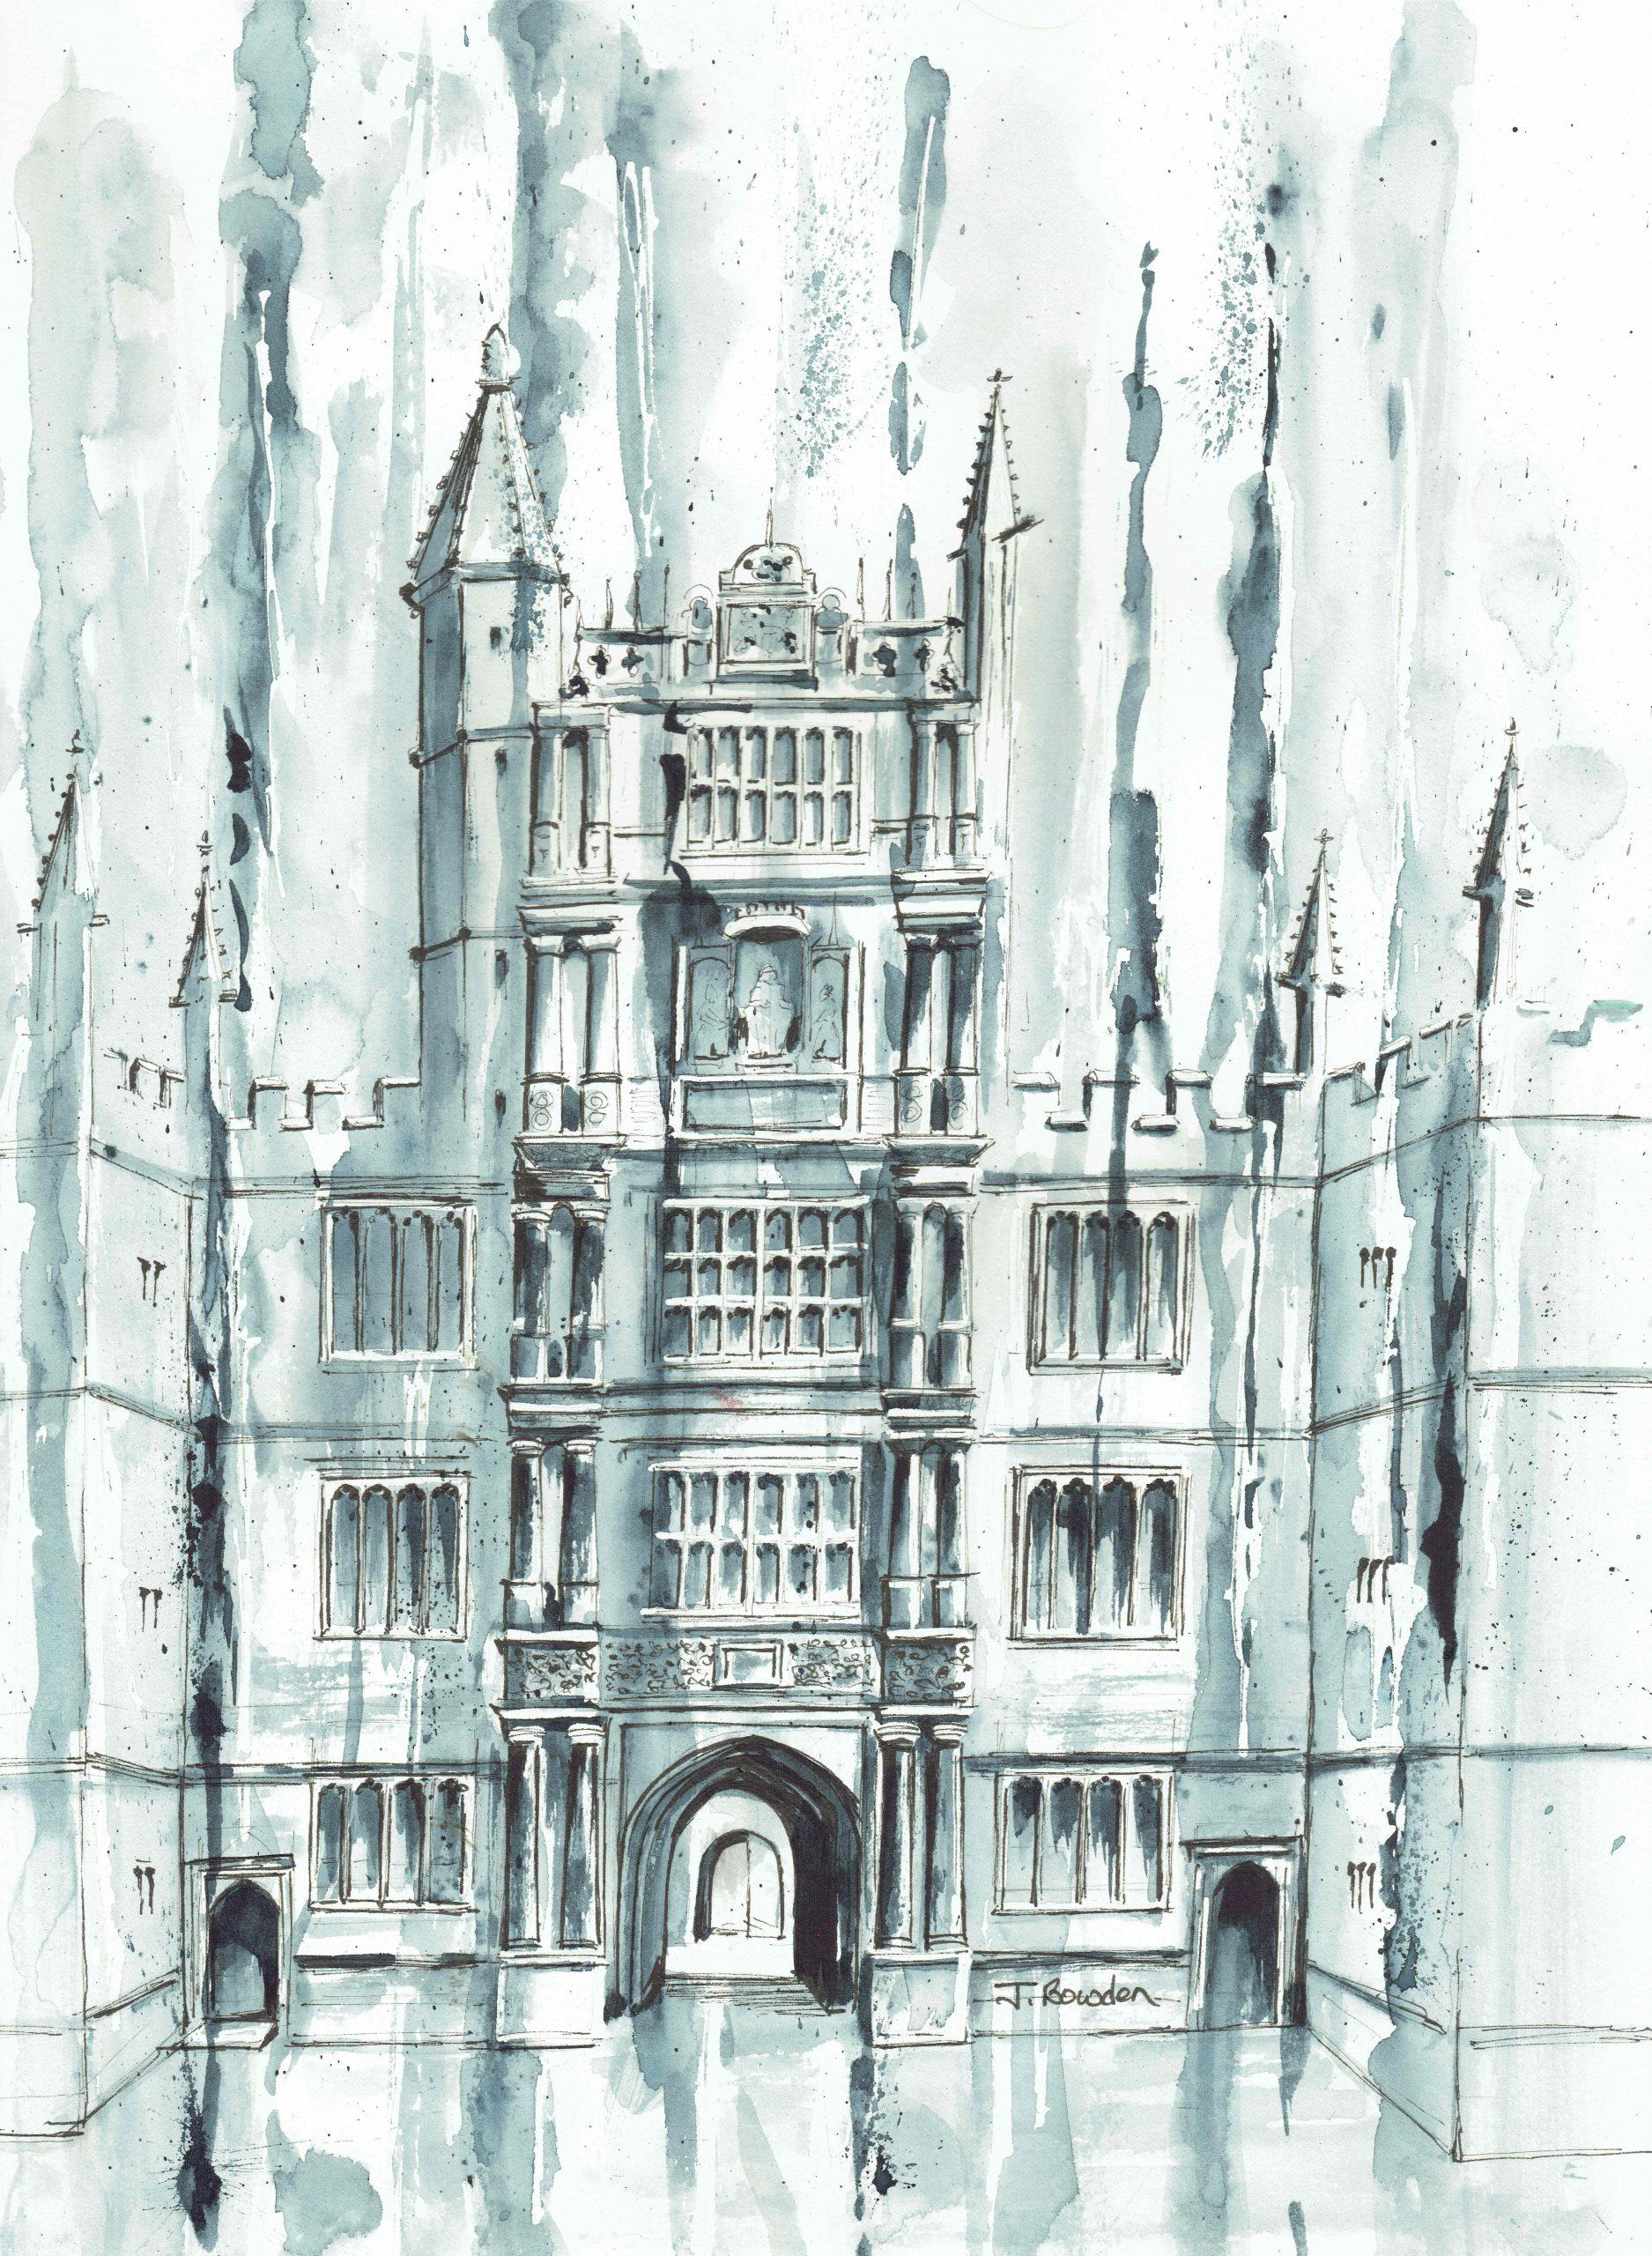 Bodleian-B+W-Abstract